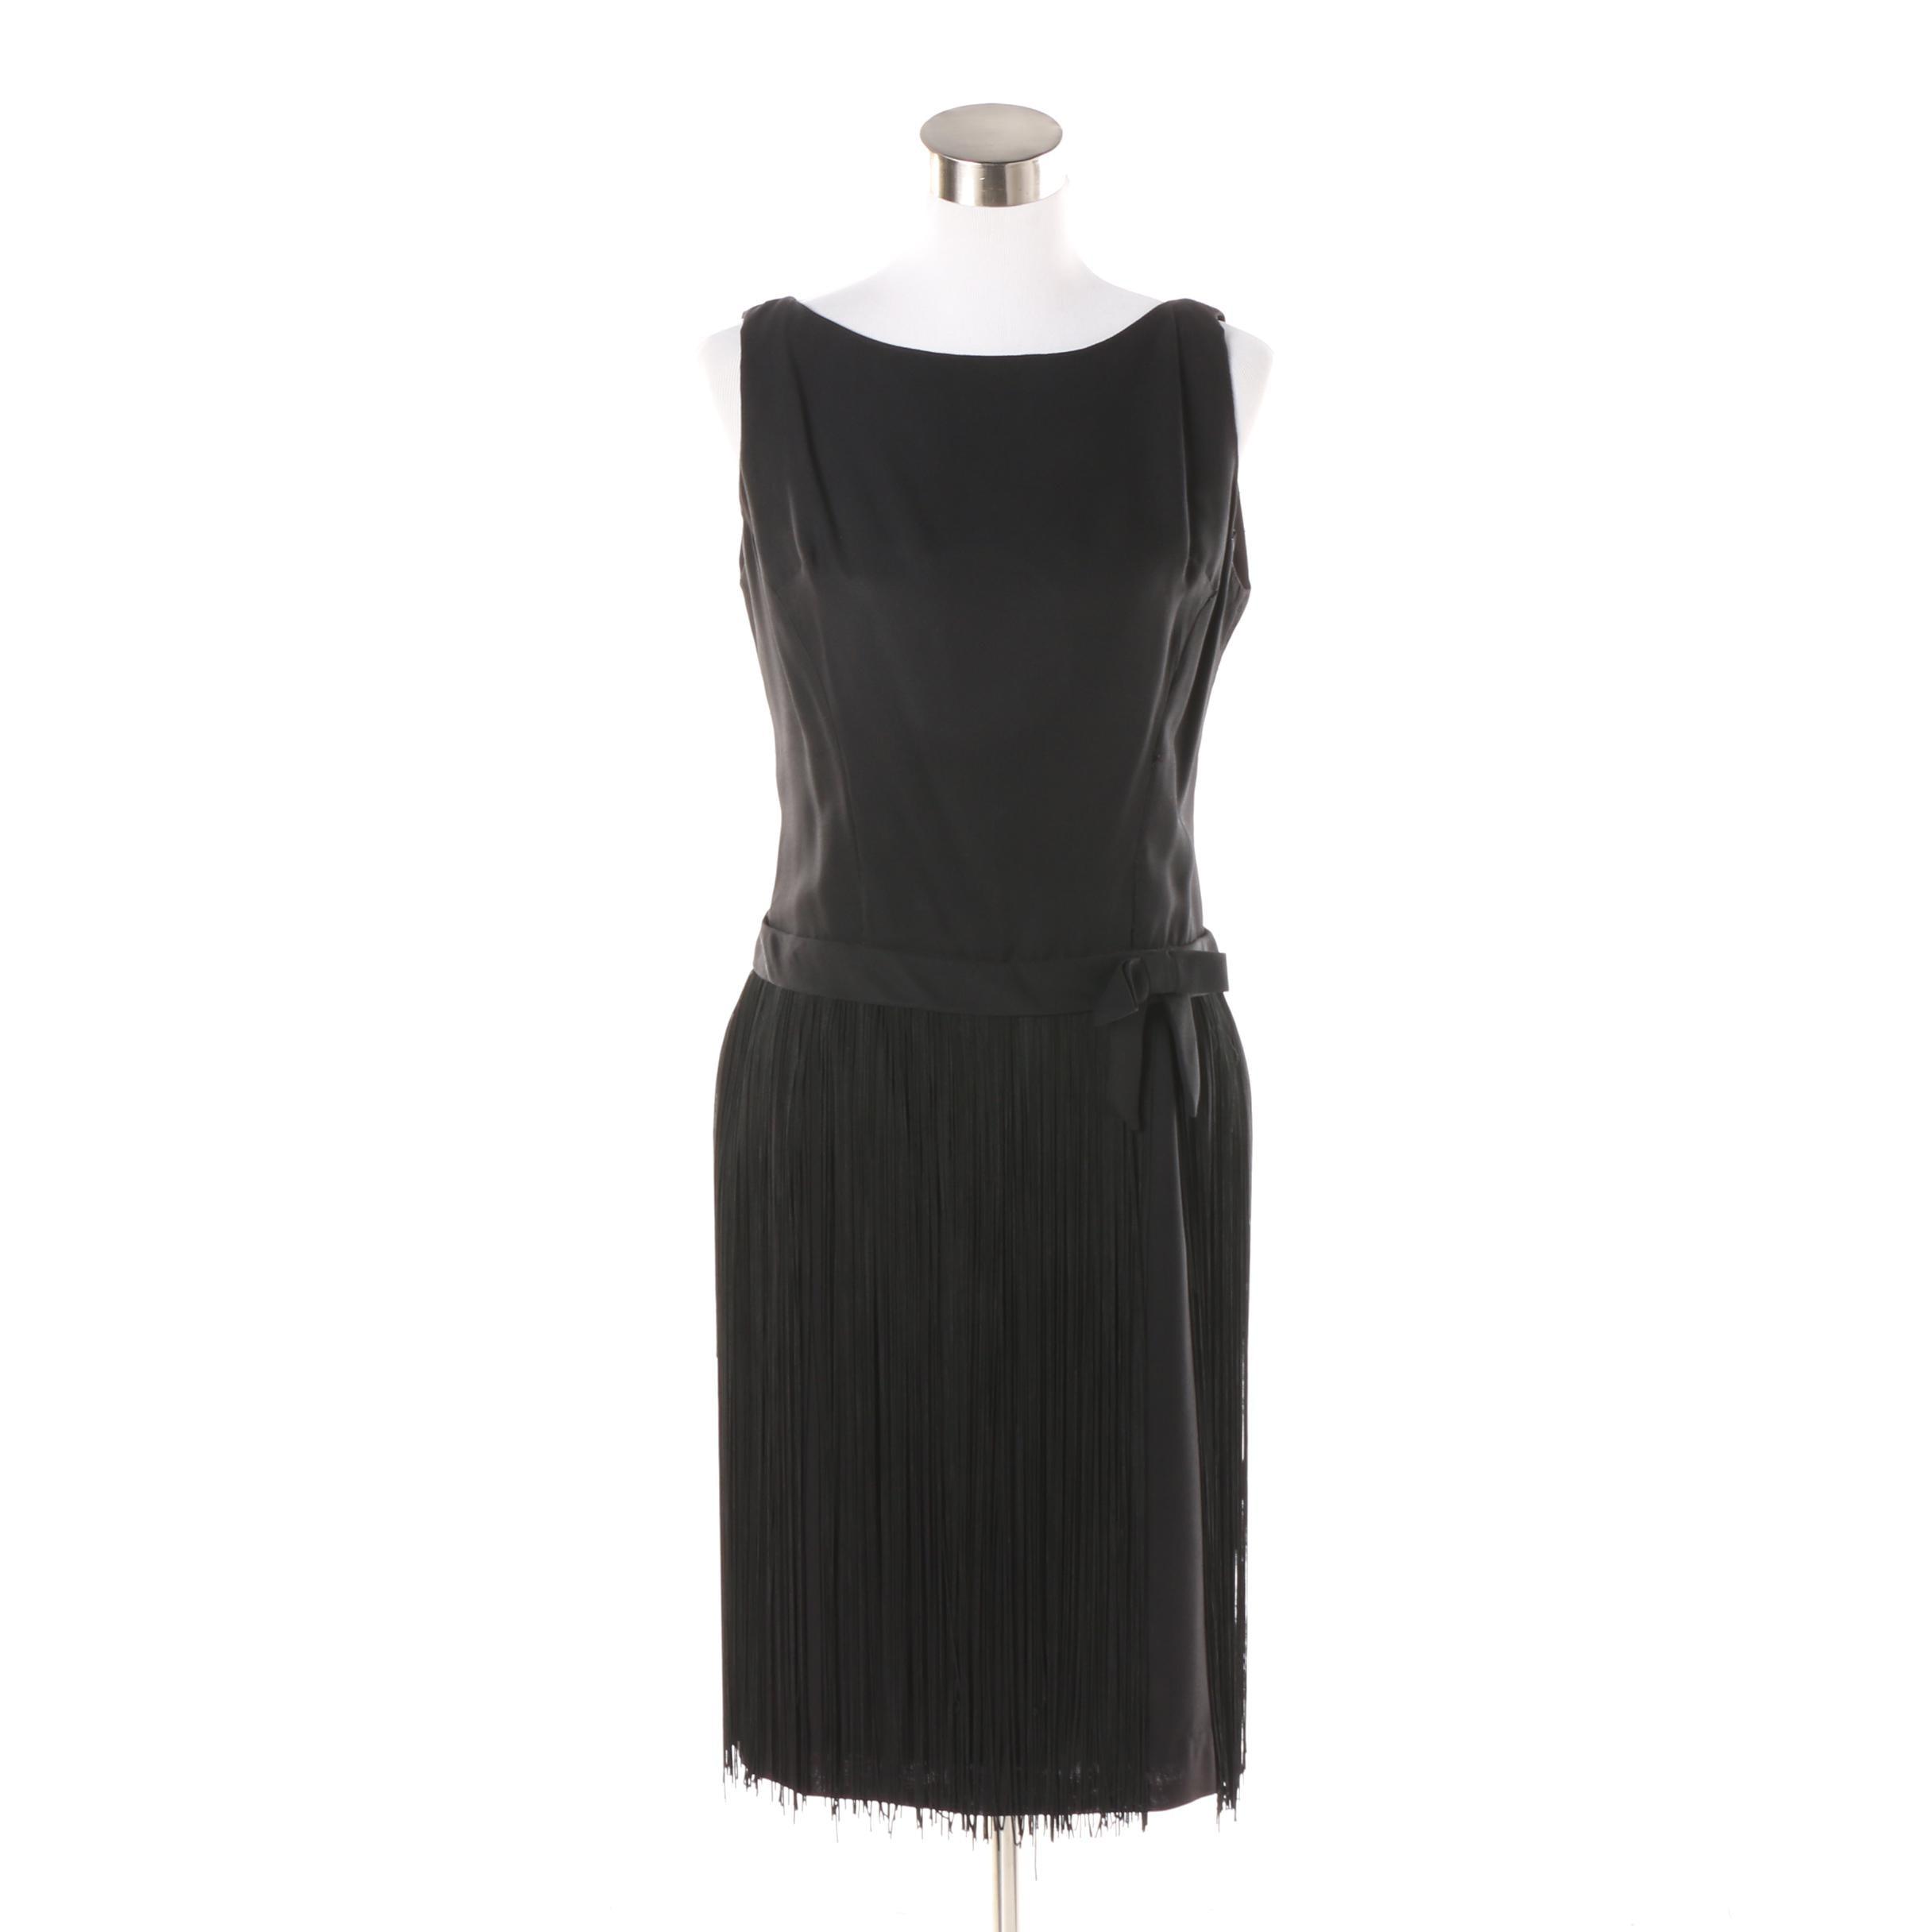 Women's Vintage Black Crepe Sleeveless Cocktail Dress